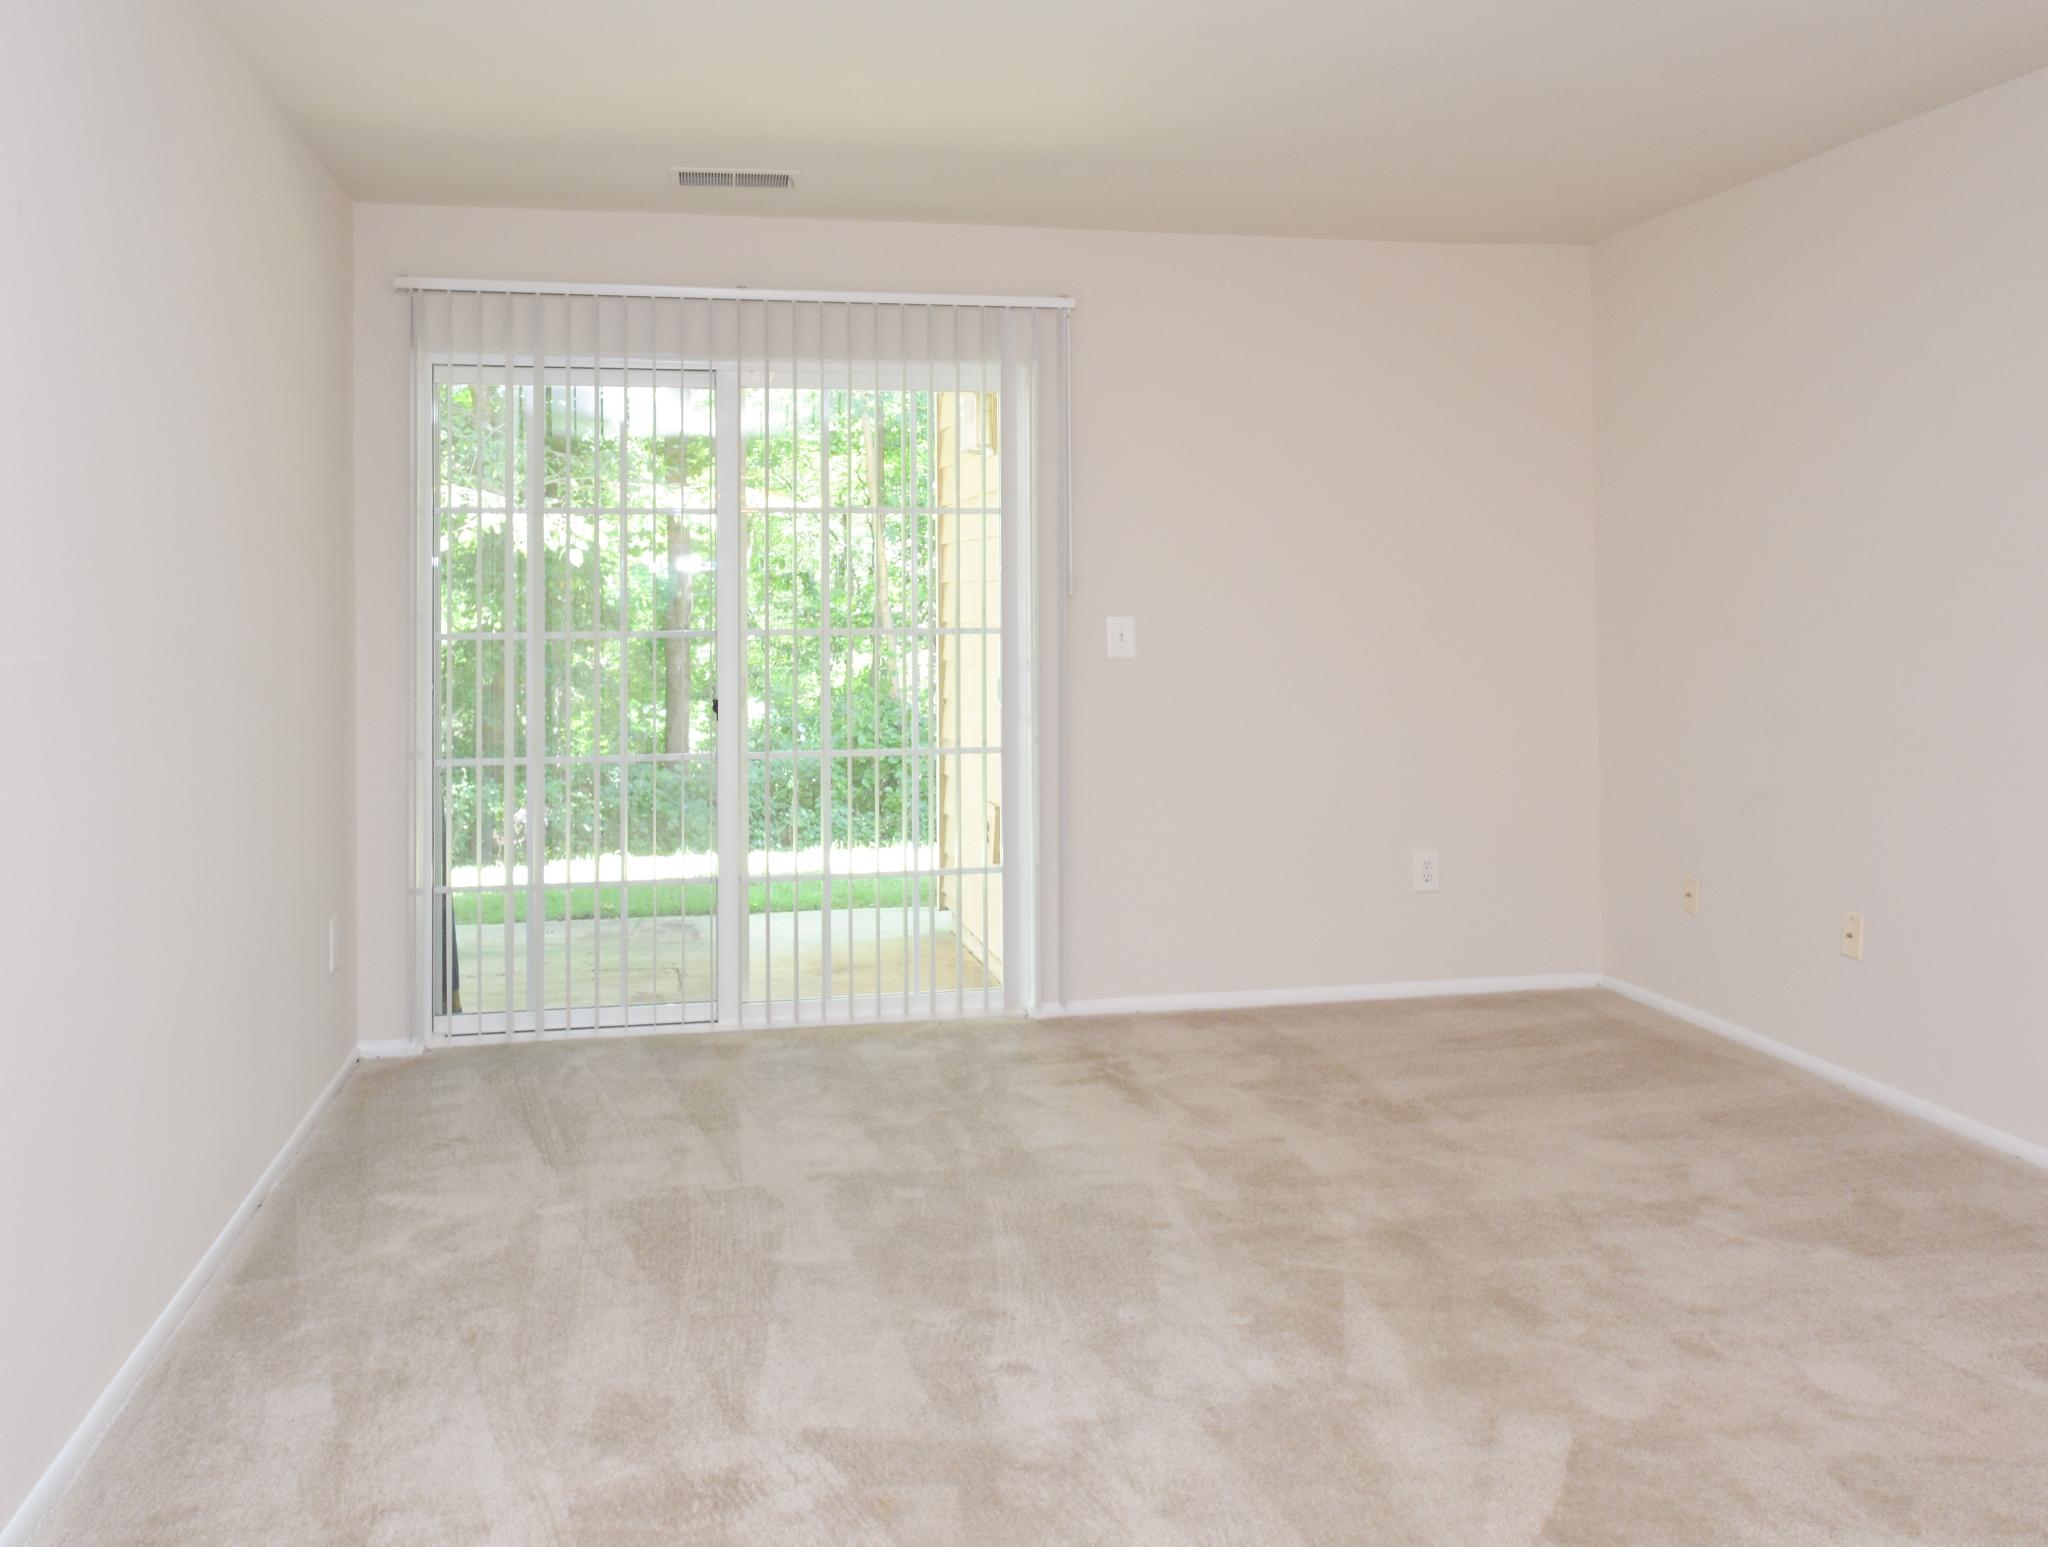 Elegant Living Area | Apartments Laurel, MD | Spring House Apartments